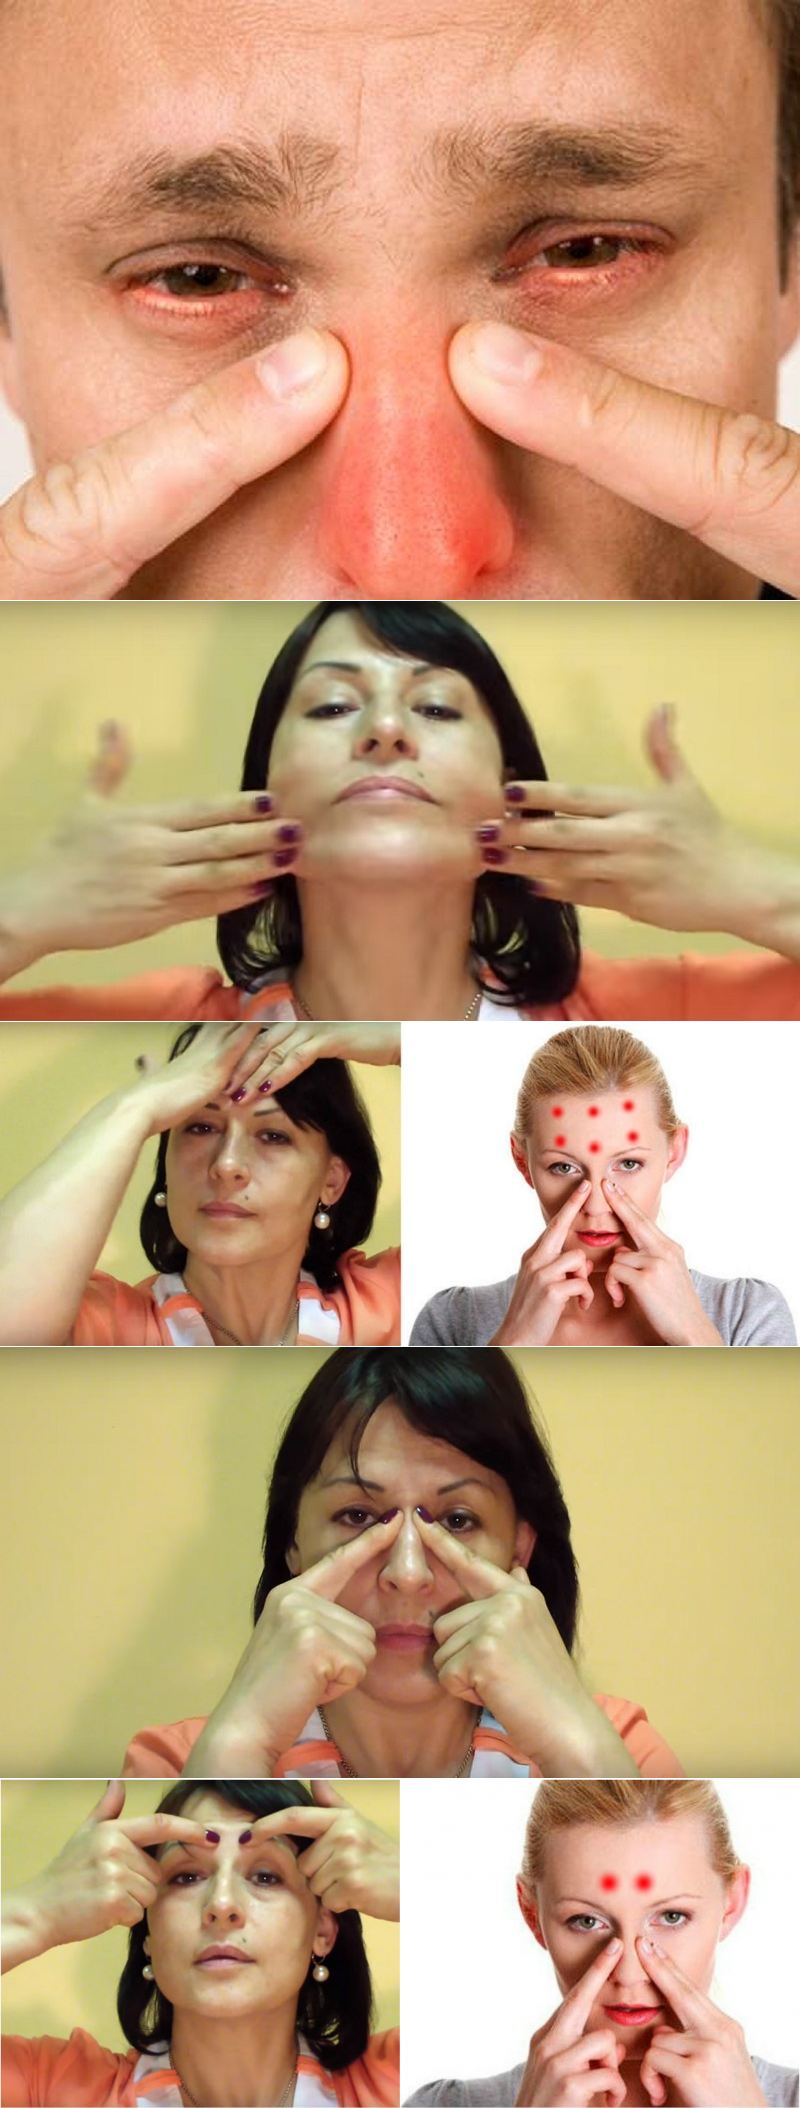 массаж точек при гайморите